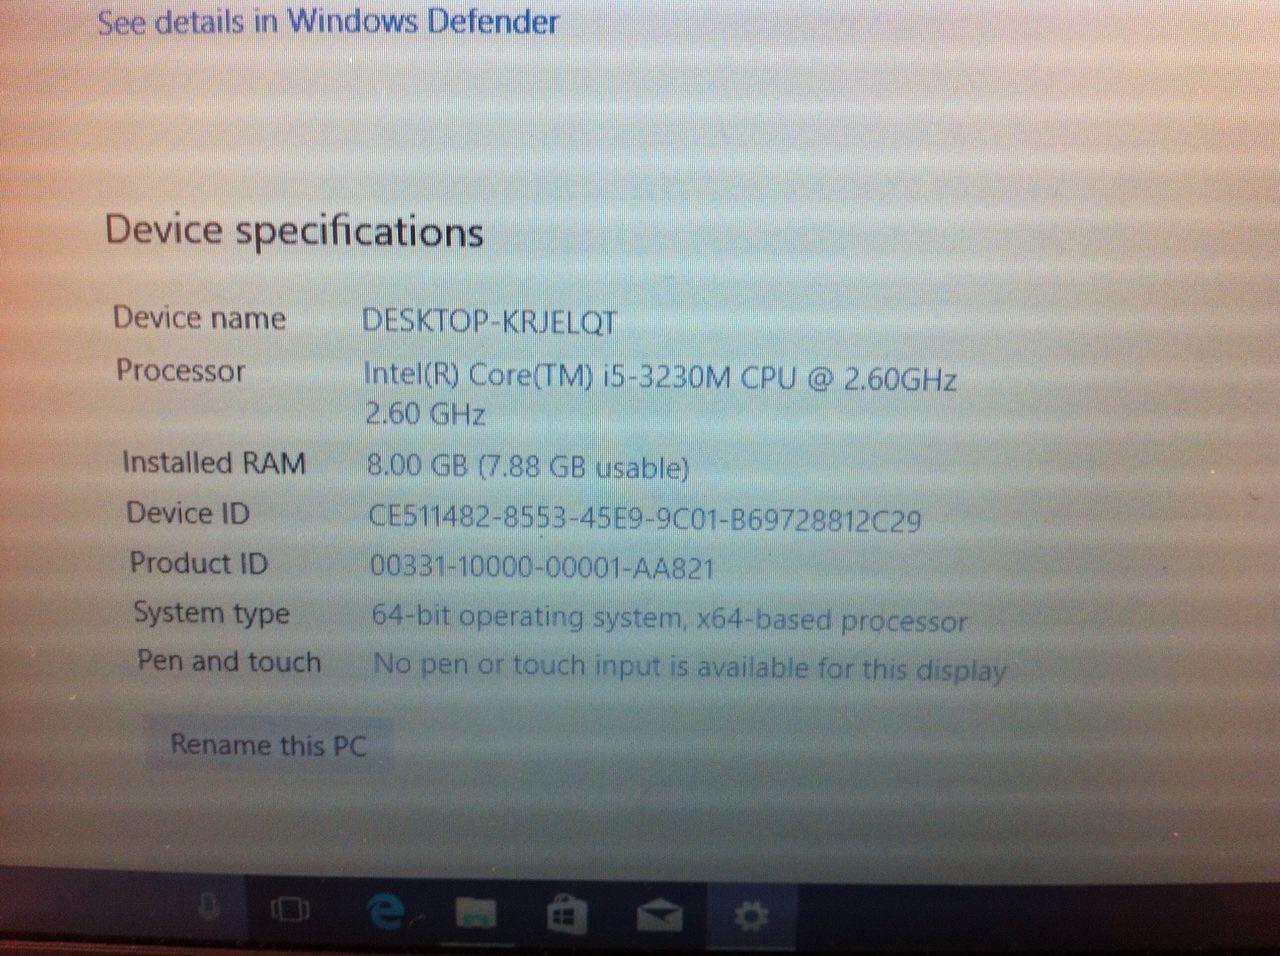 Hp Probook 6570B core i5, 500GB harddrive, 8GB Ram, window 10, R2900